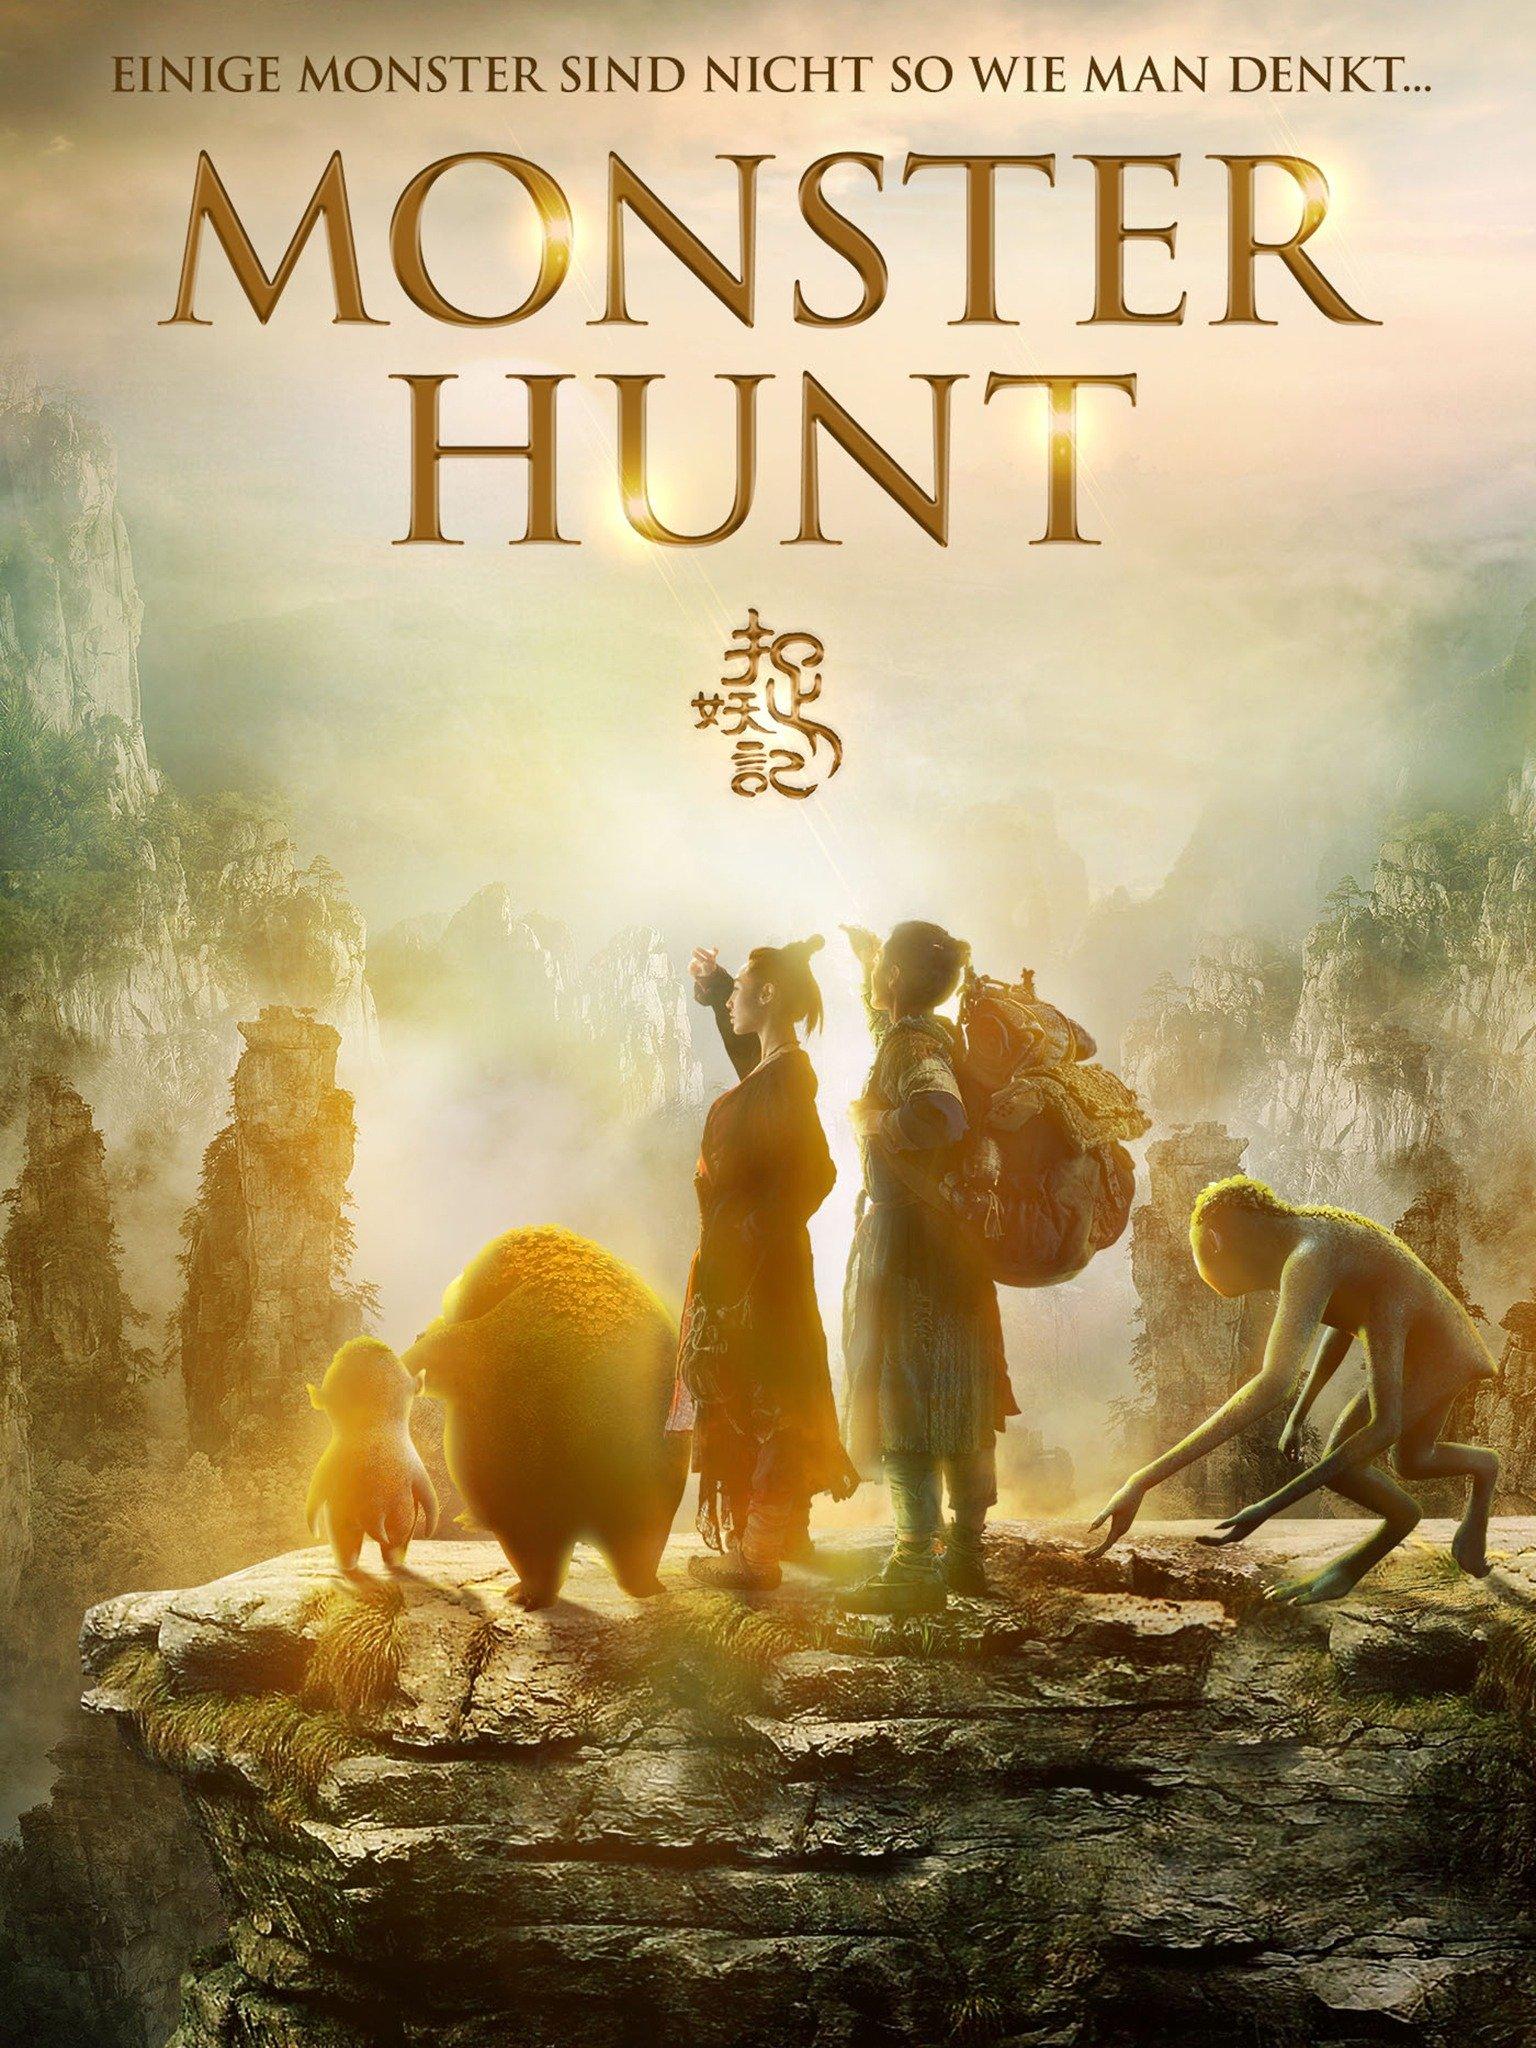 Monster Hunt (2015) ORG Hindi Dual Audio 300MB BluRay 480p ESubs Free Download